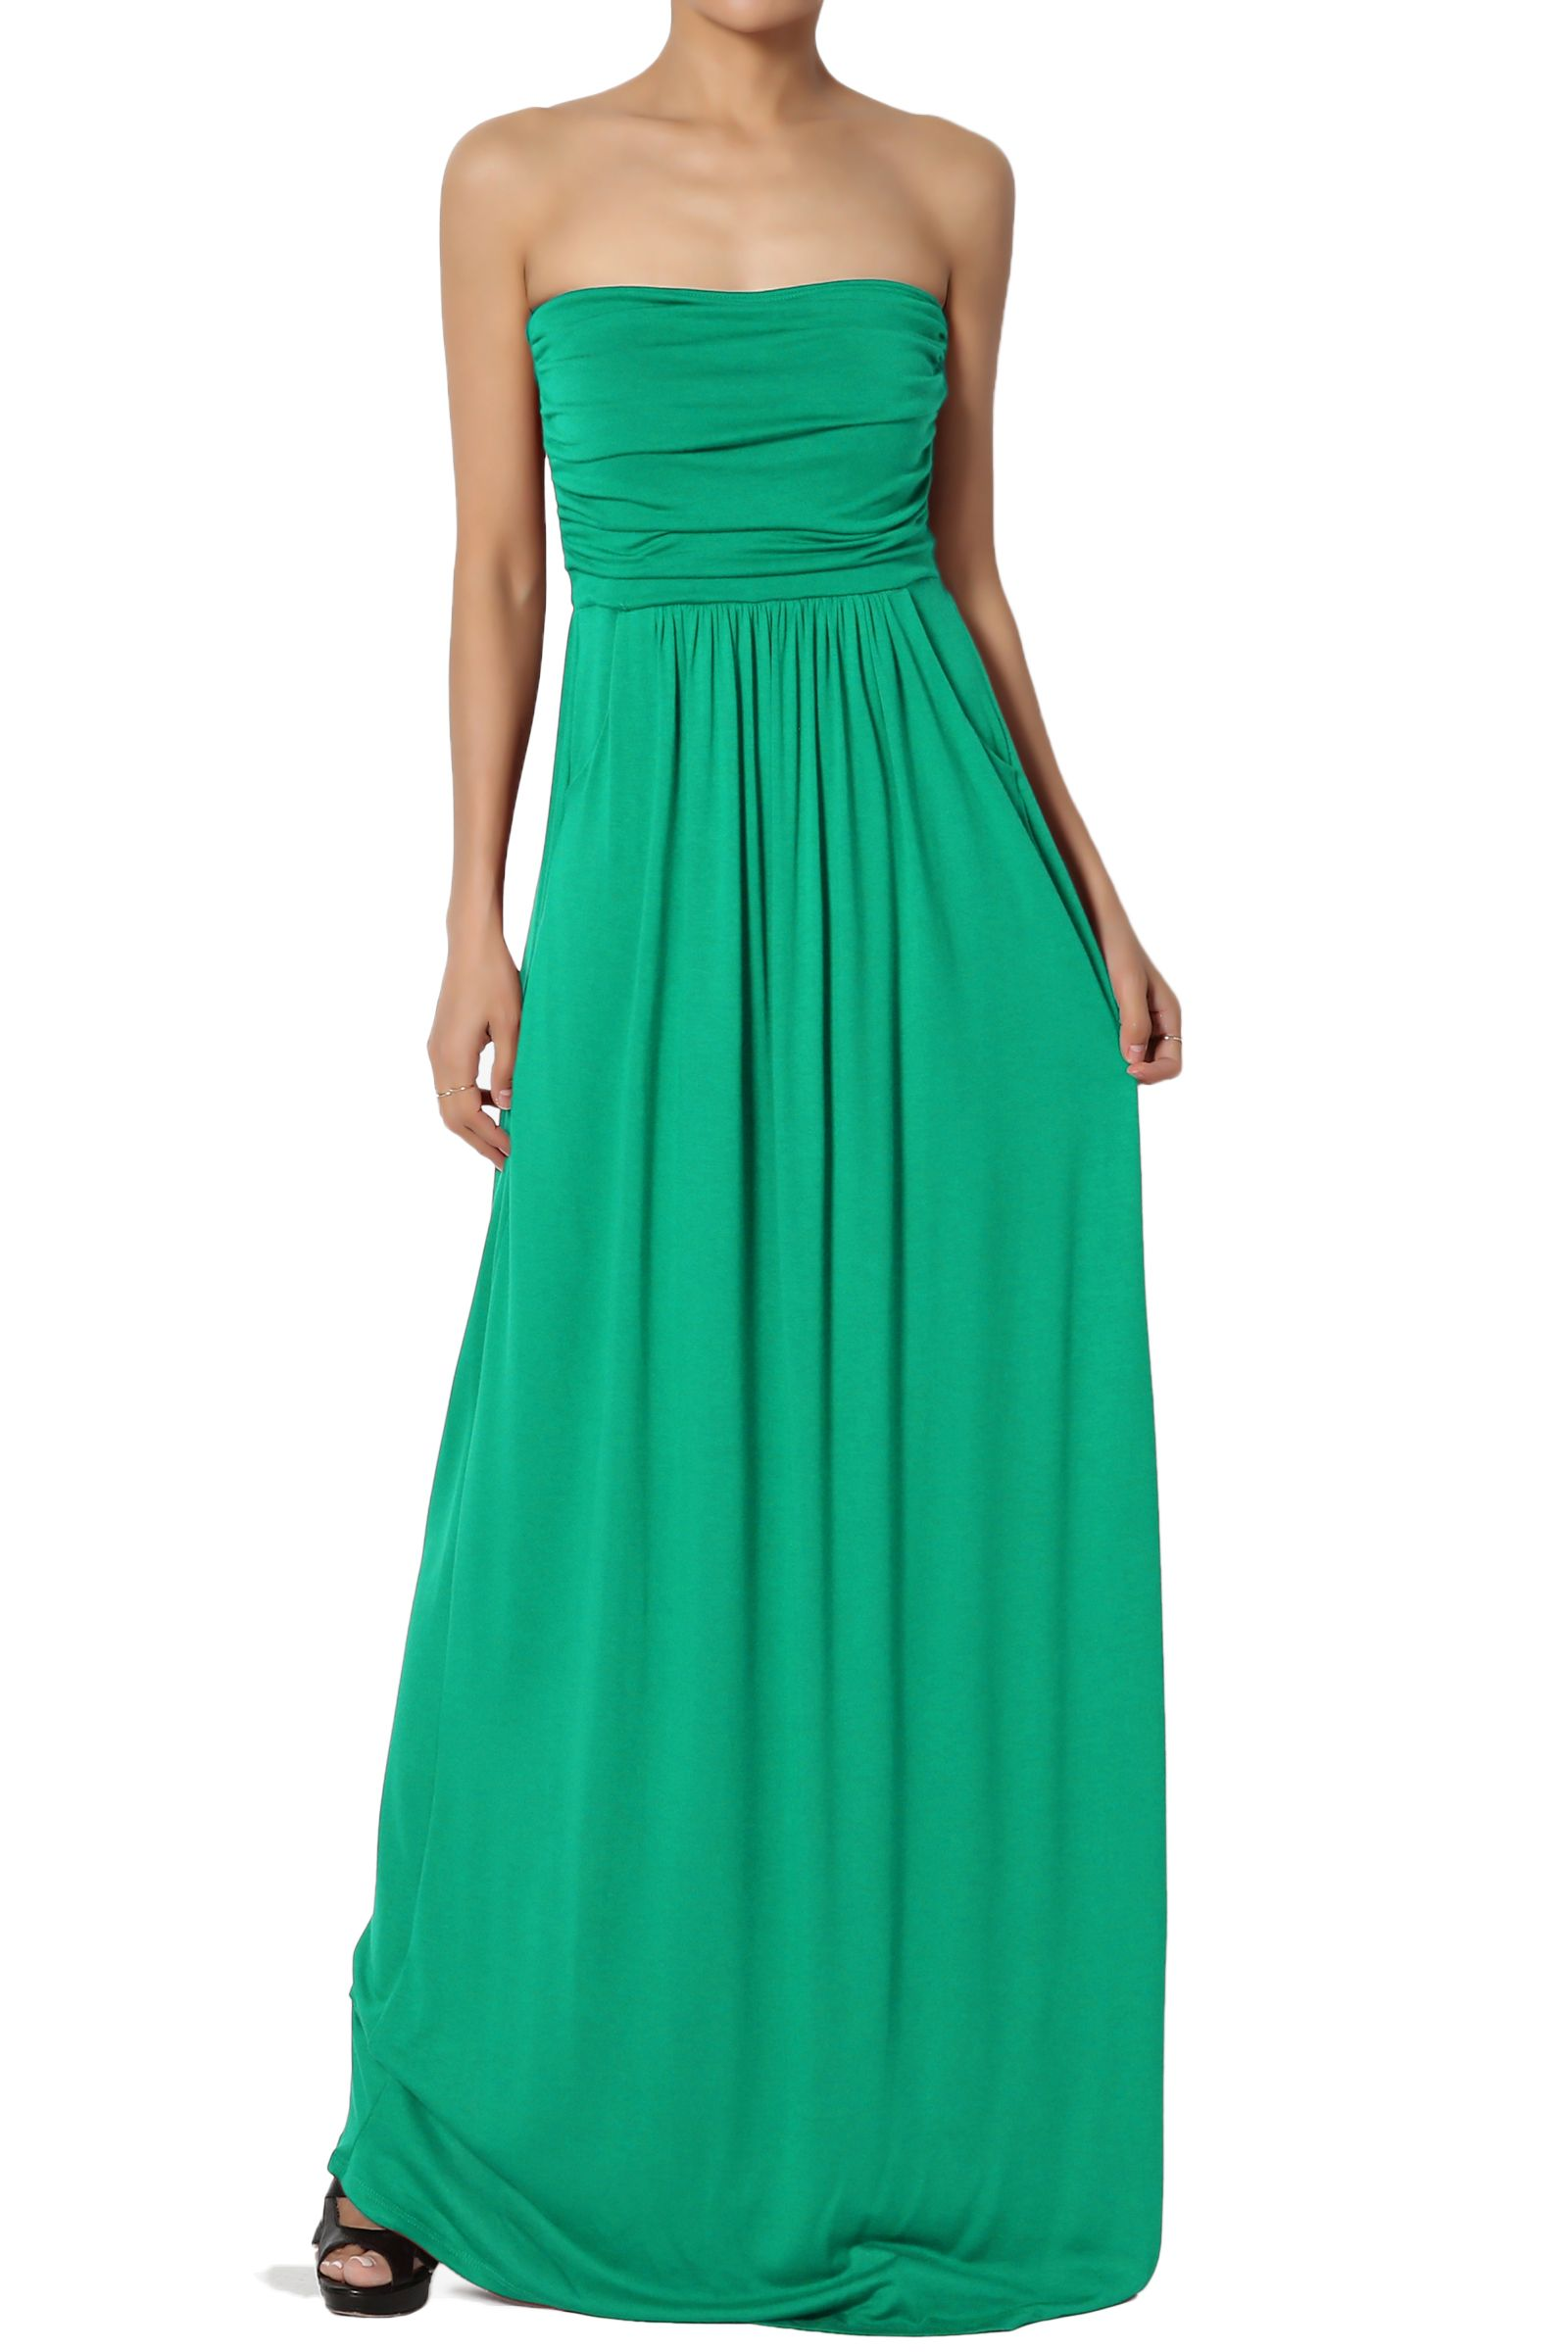 Themogan Themogan Women S Strapless Ruched Pocket Maxi Dress Tube Top Long Skirt Sundress Cover Up Walmart Com Maxi Dress Tube Dress Maxi Knit Dress [ 2400 x 1600 Pixel ]